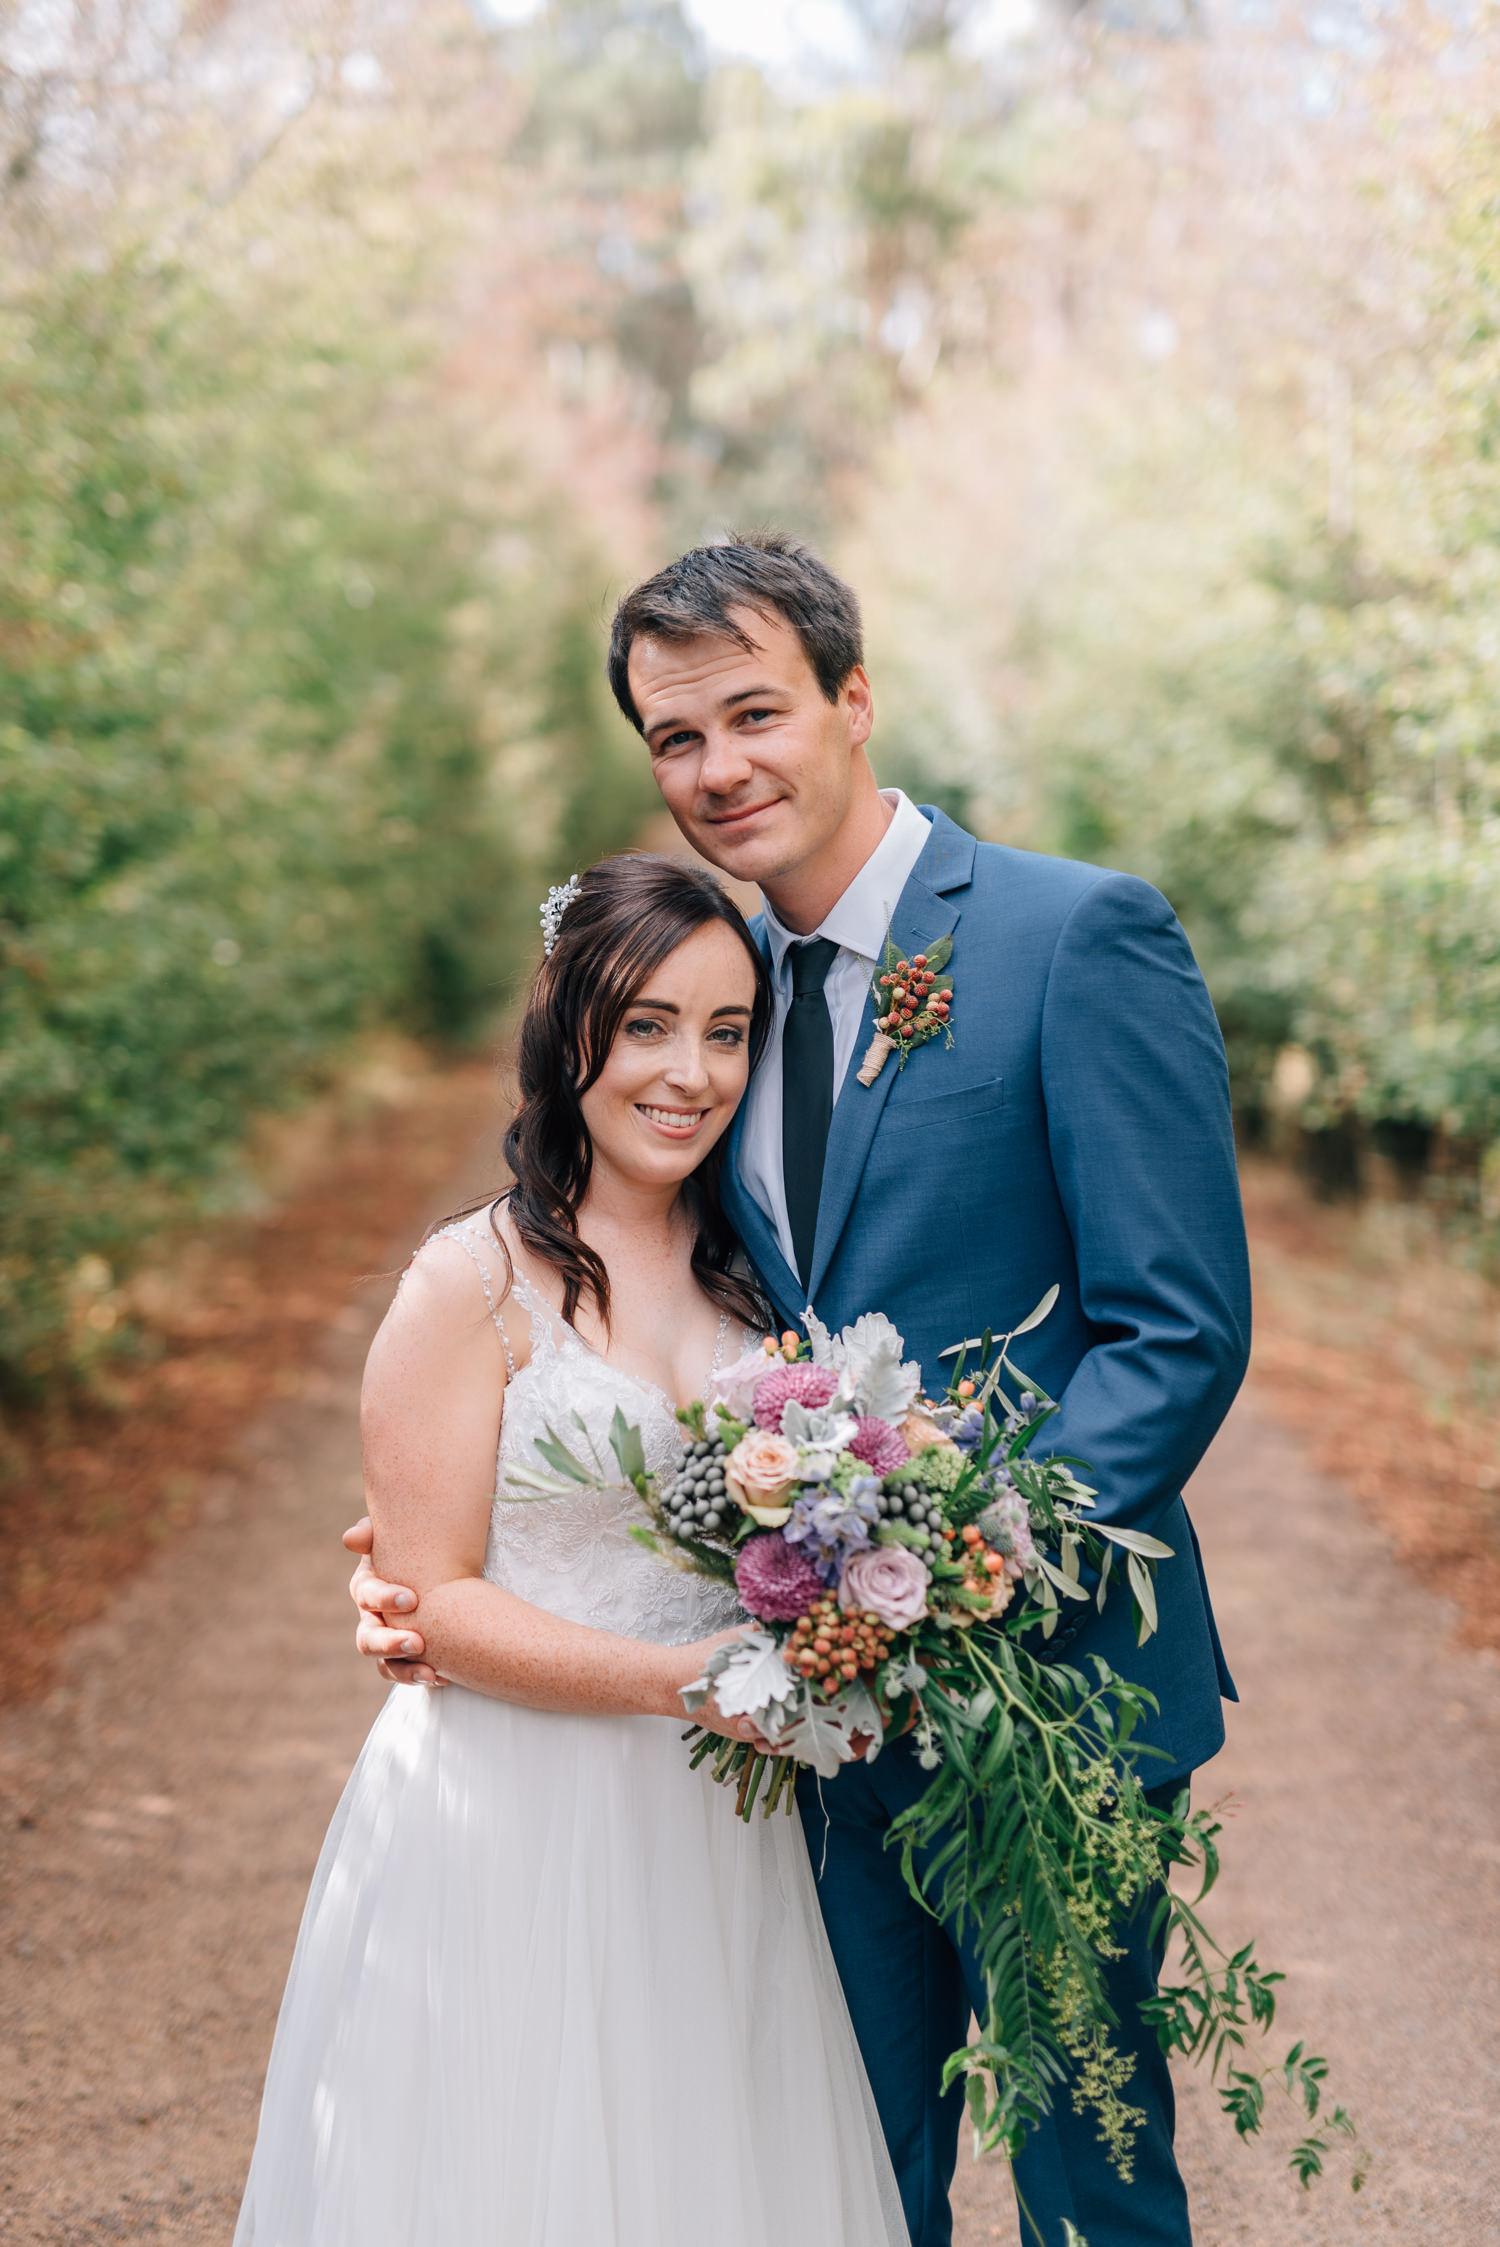 Quamby-Wedding-Photographer-105.jpg